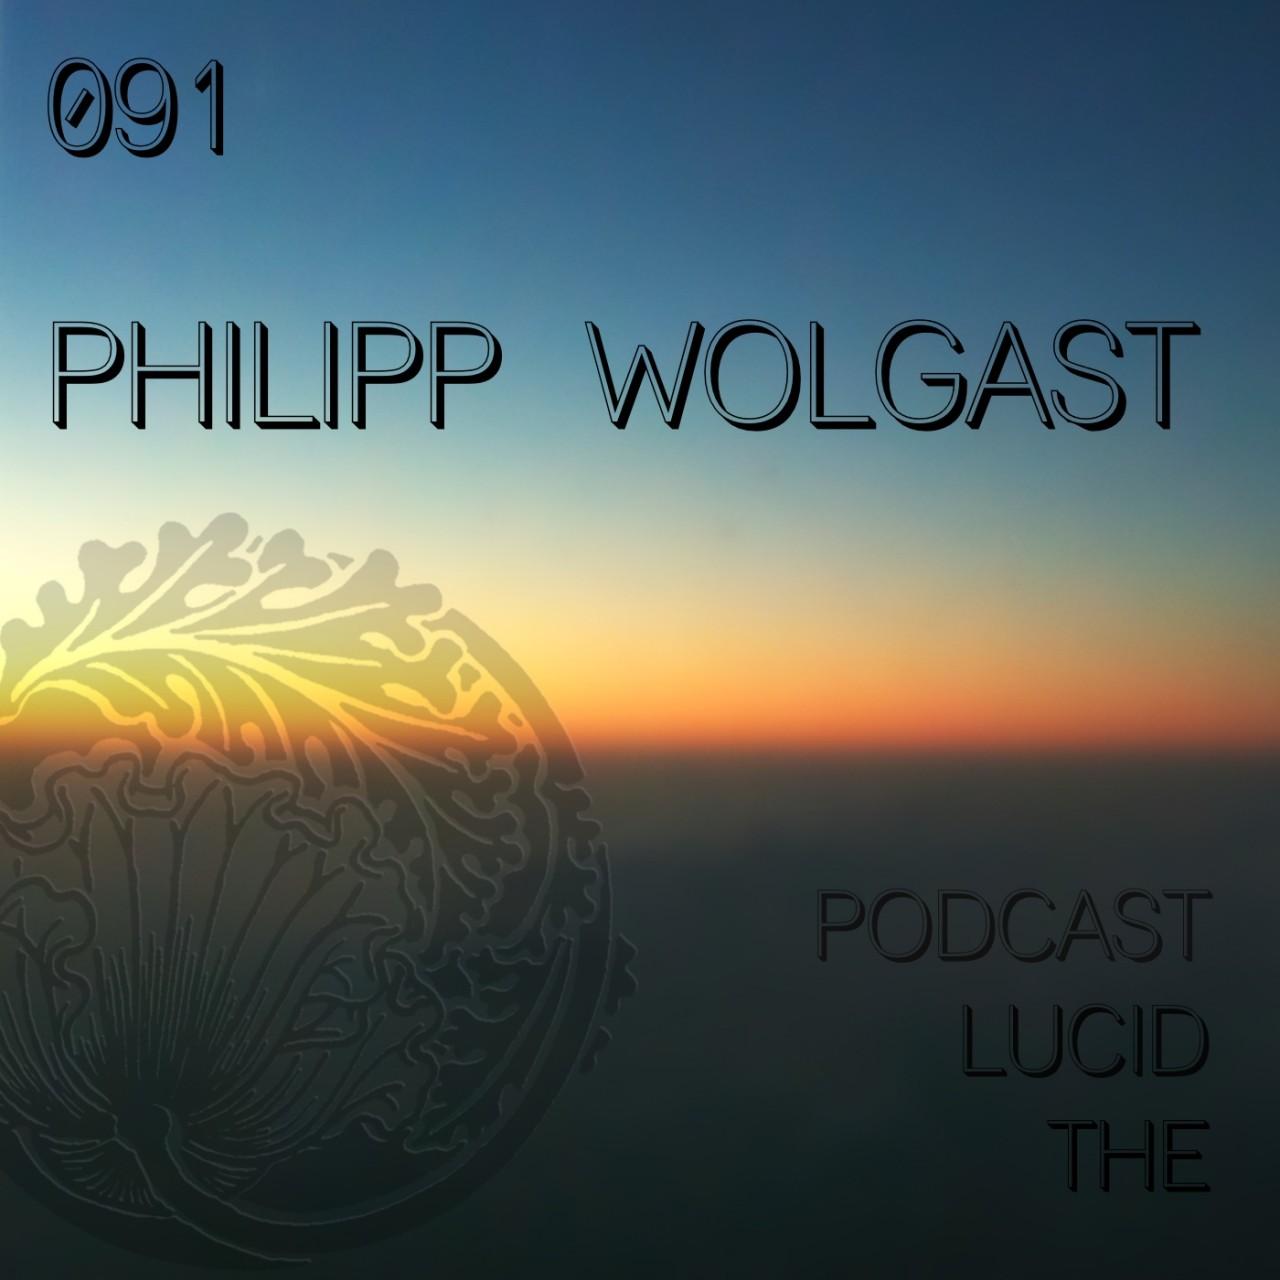 The Lucid Podcast 091 Philipp Wolgast